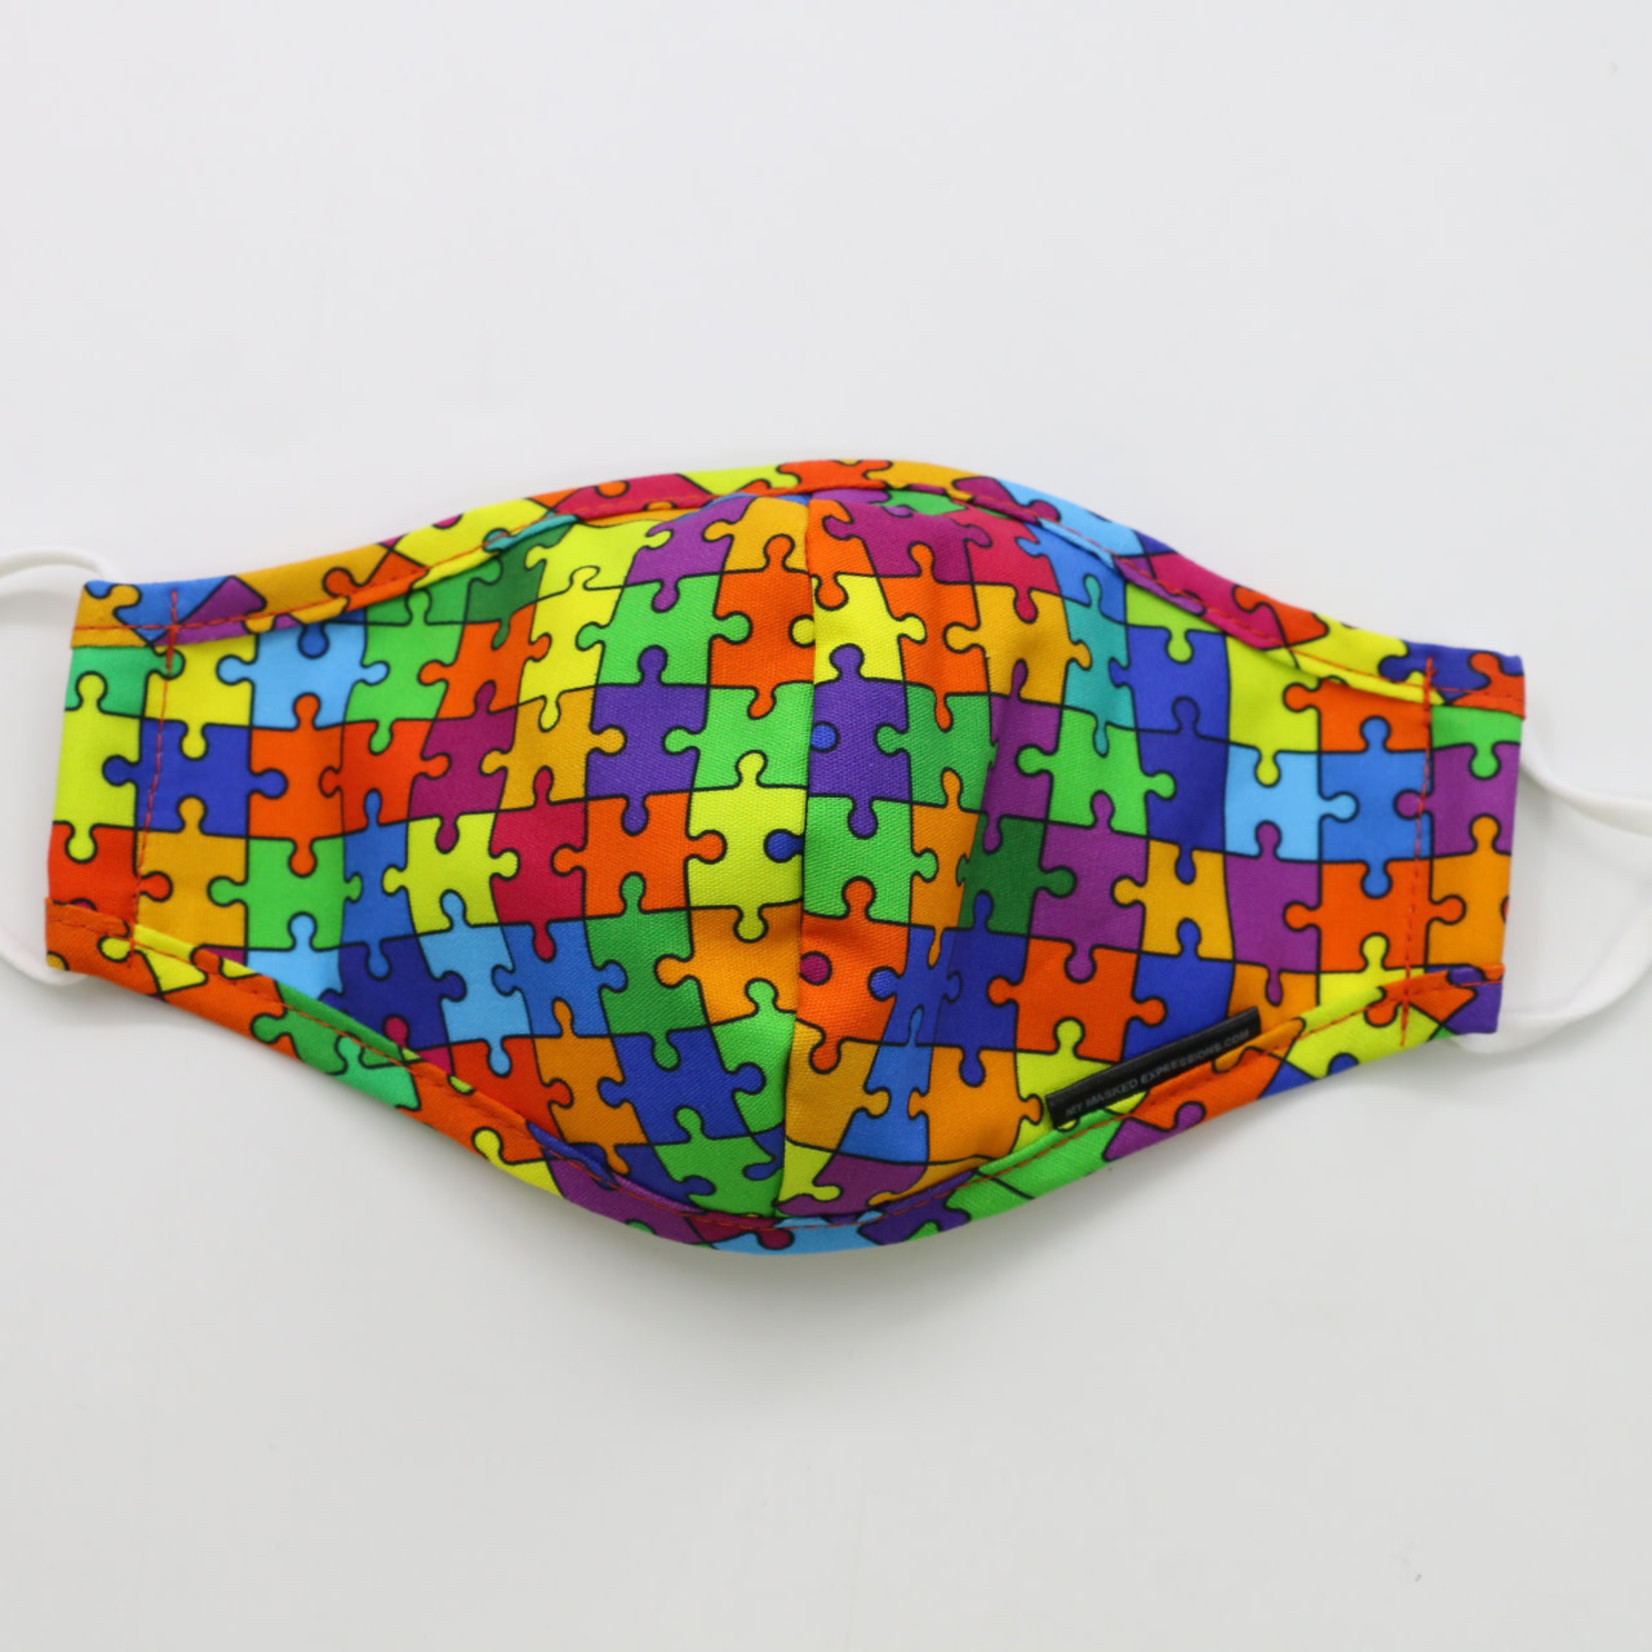 My Masked Expressions Kids' Size Mask, Jigsaw Puzzle